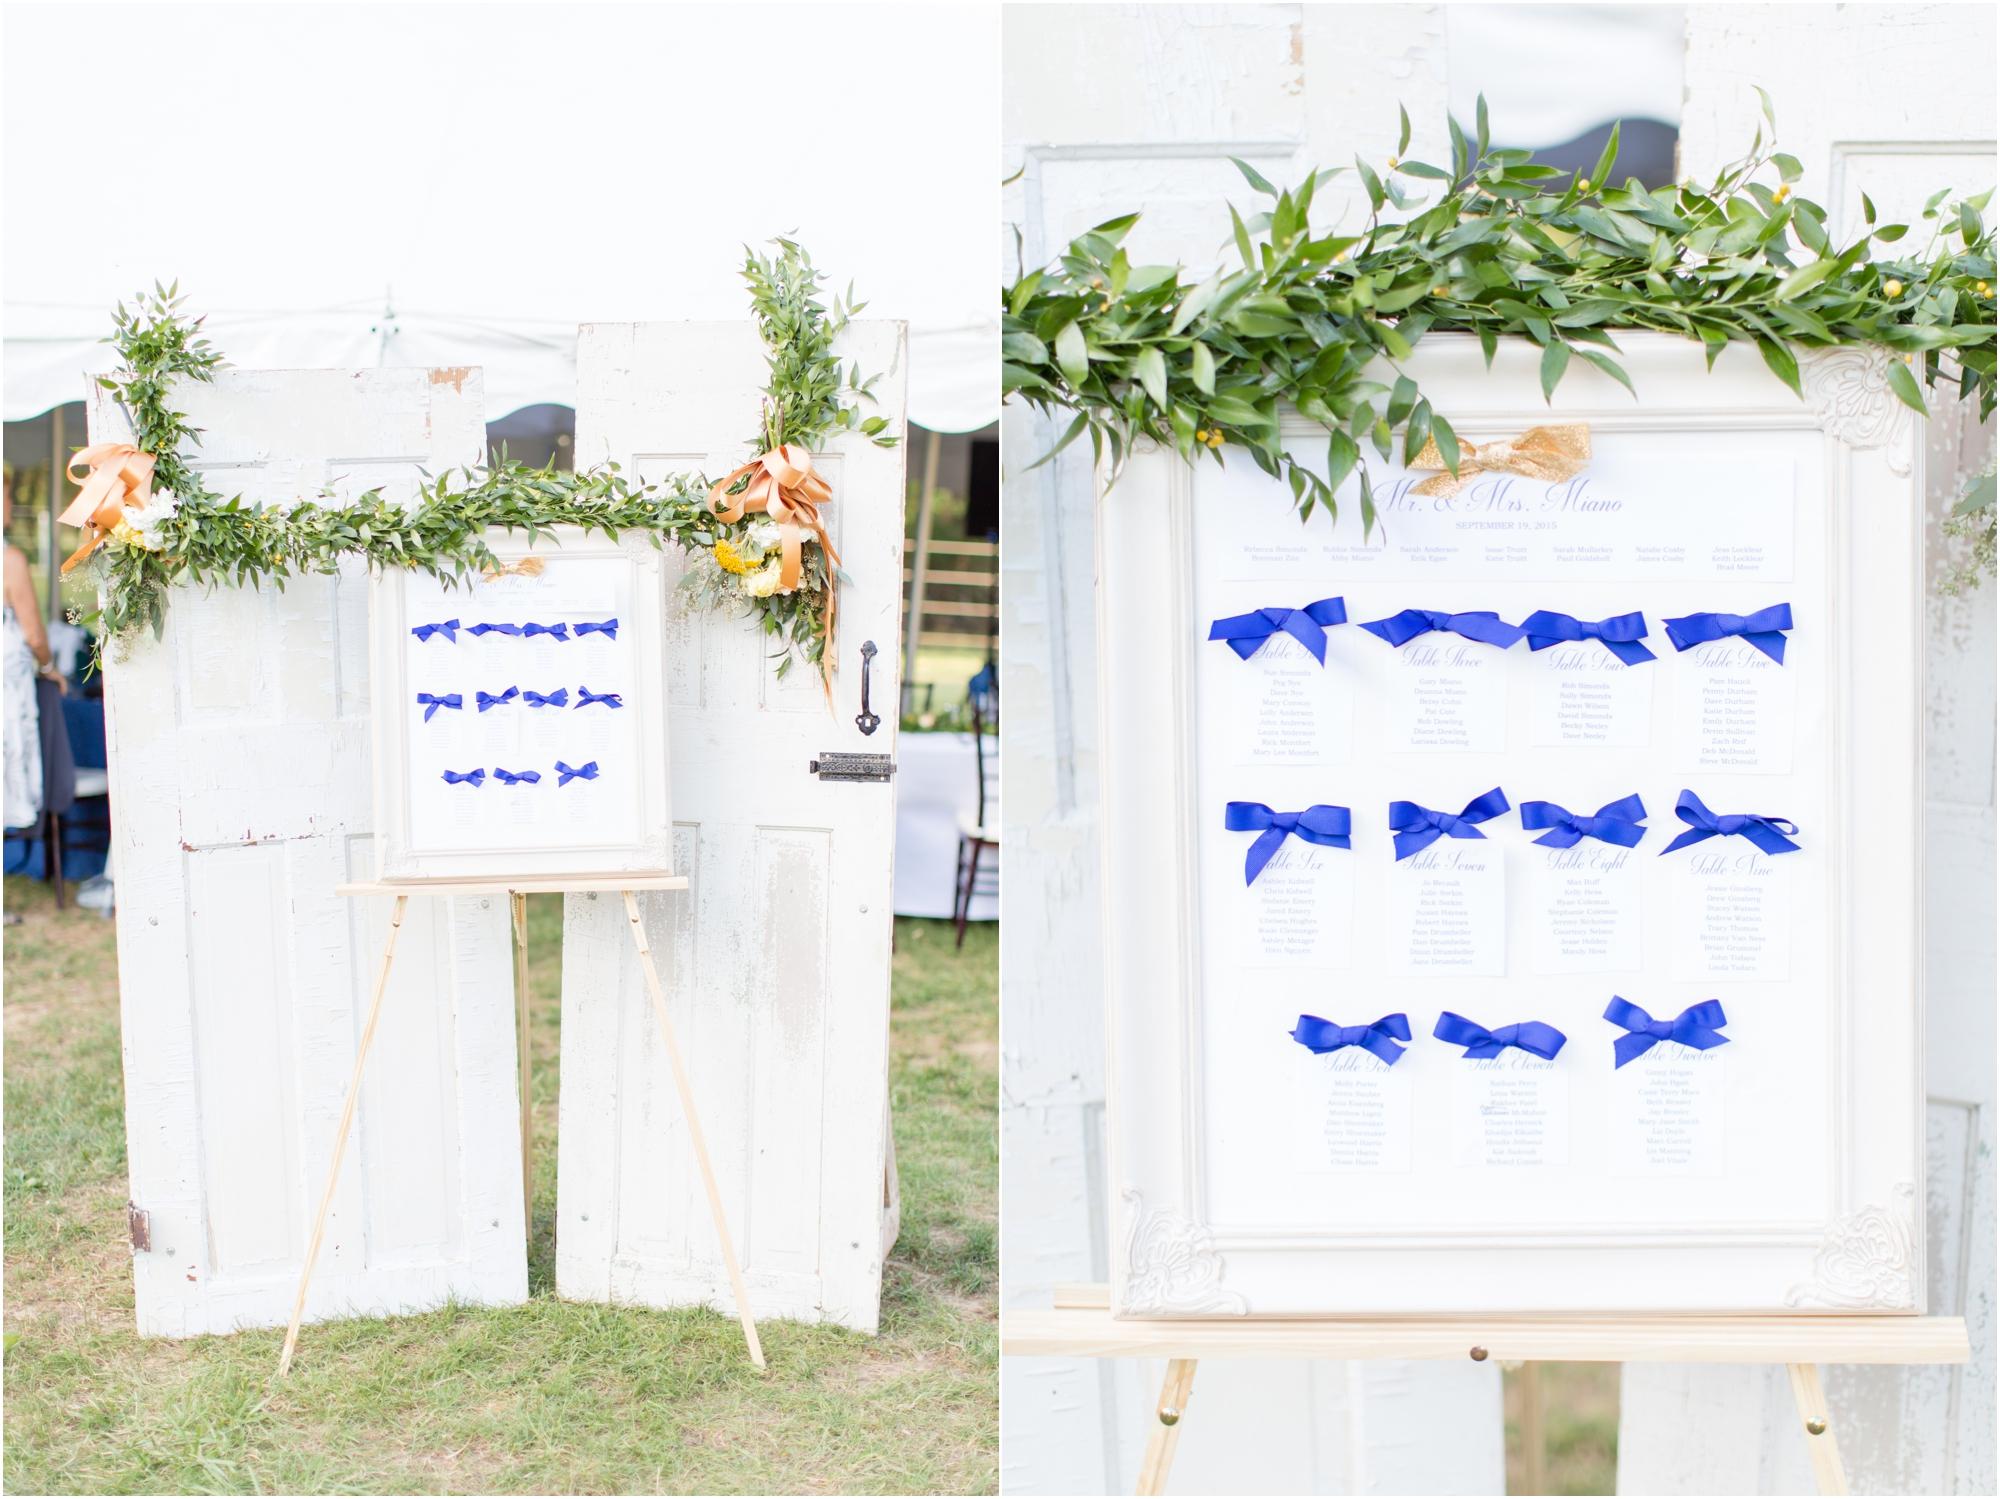 7-Miano Wedding Reception-716_anna grace photography maryland wedding photographer rockland estates.jpg